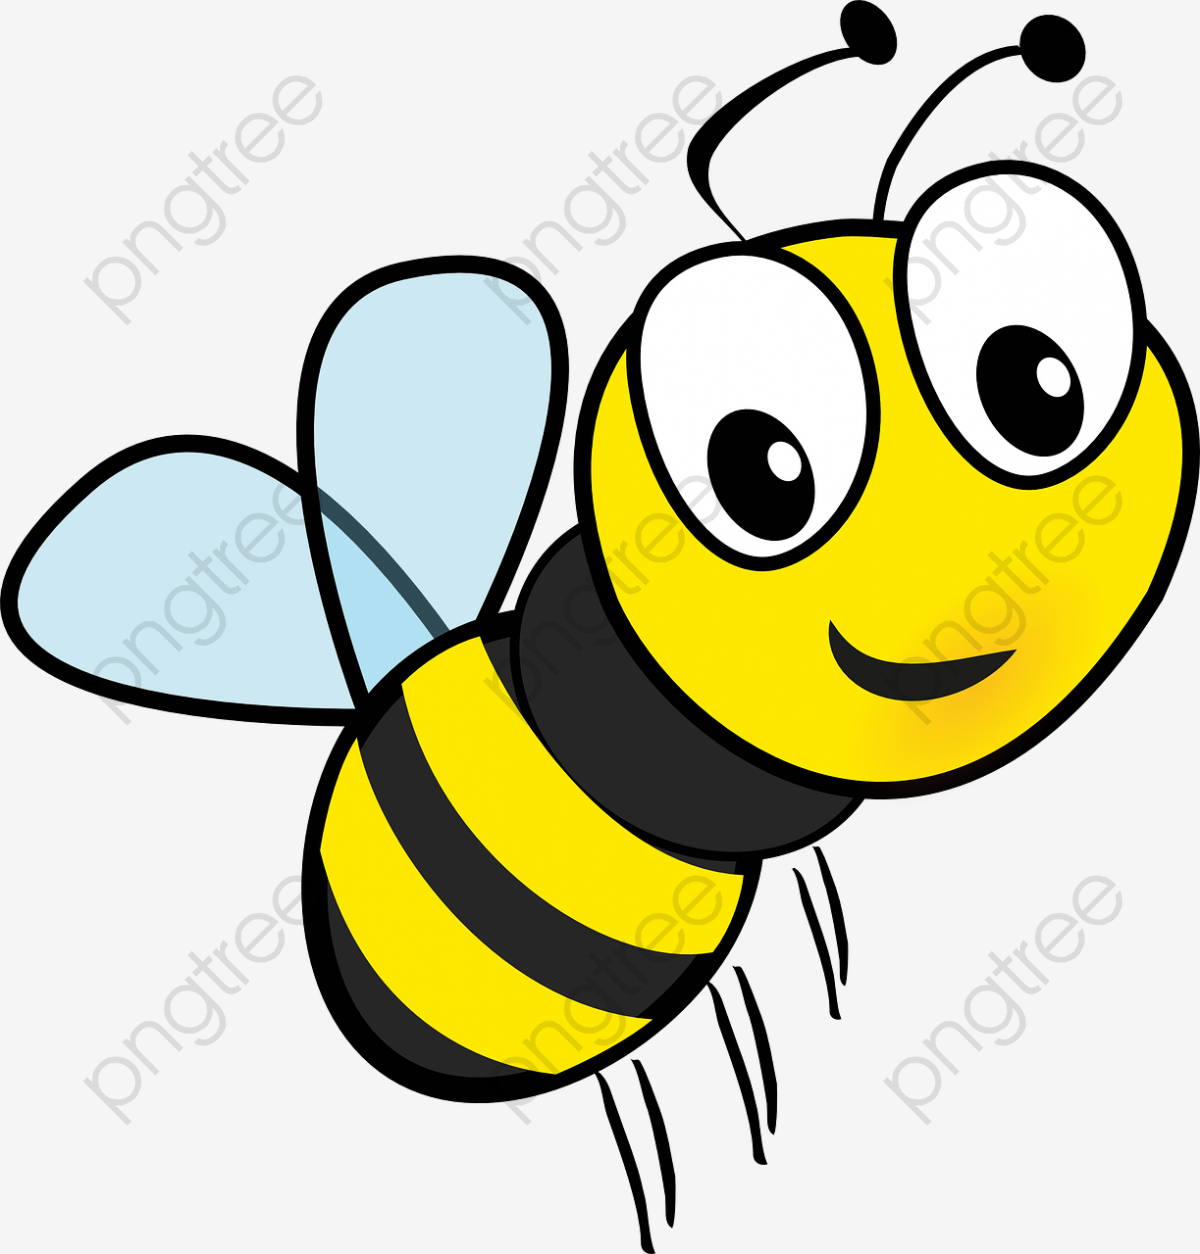 Flying Cartoon Bee, Cartoon Clipart, Bee Clipart, Flight PNG ... graphic stock